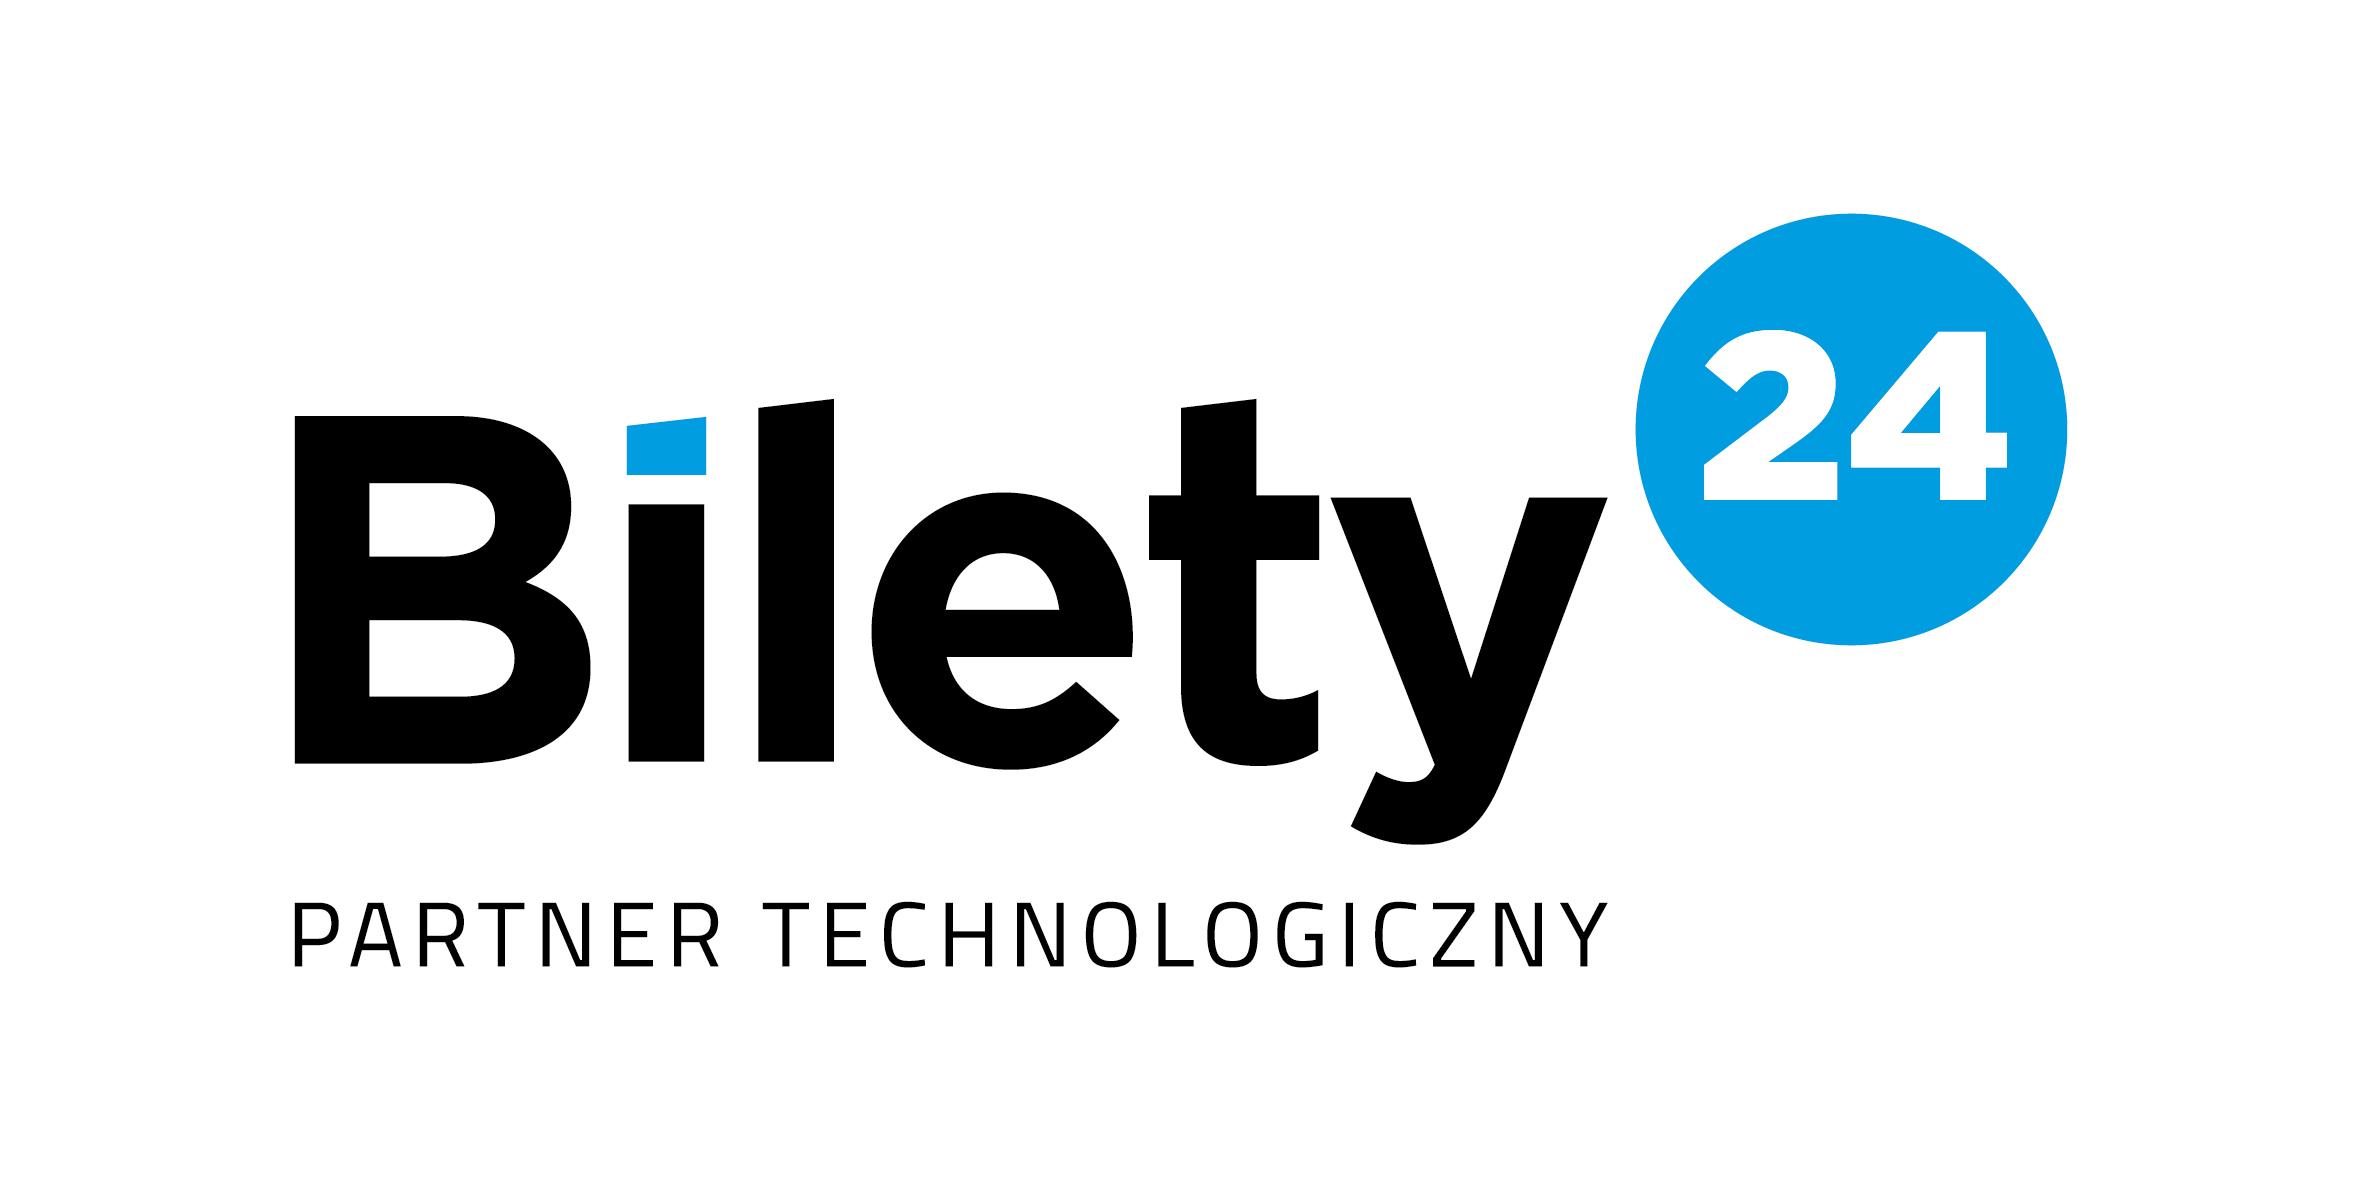 bilety24-logotyp-fullcolor+partnertechnologiczny